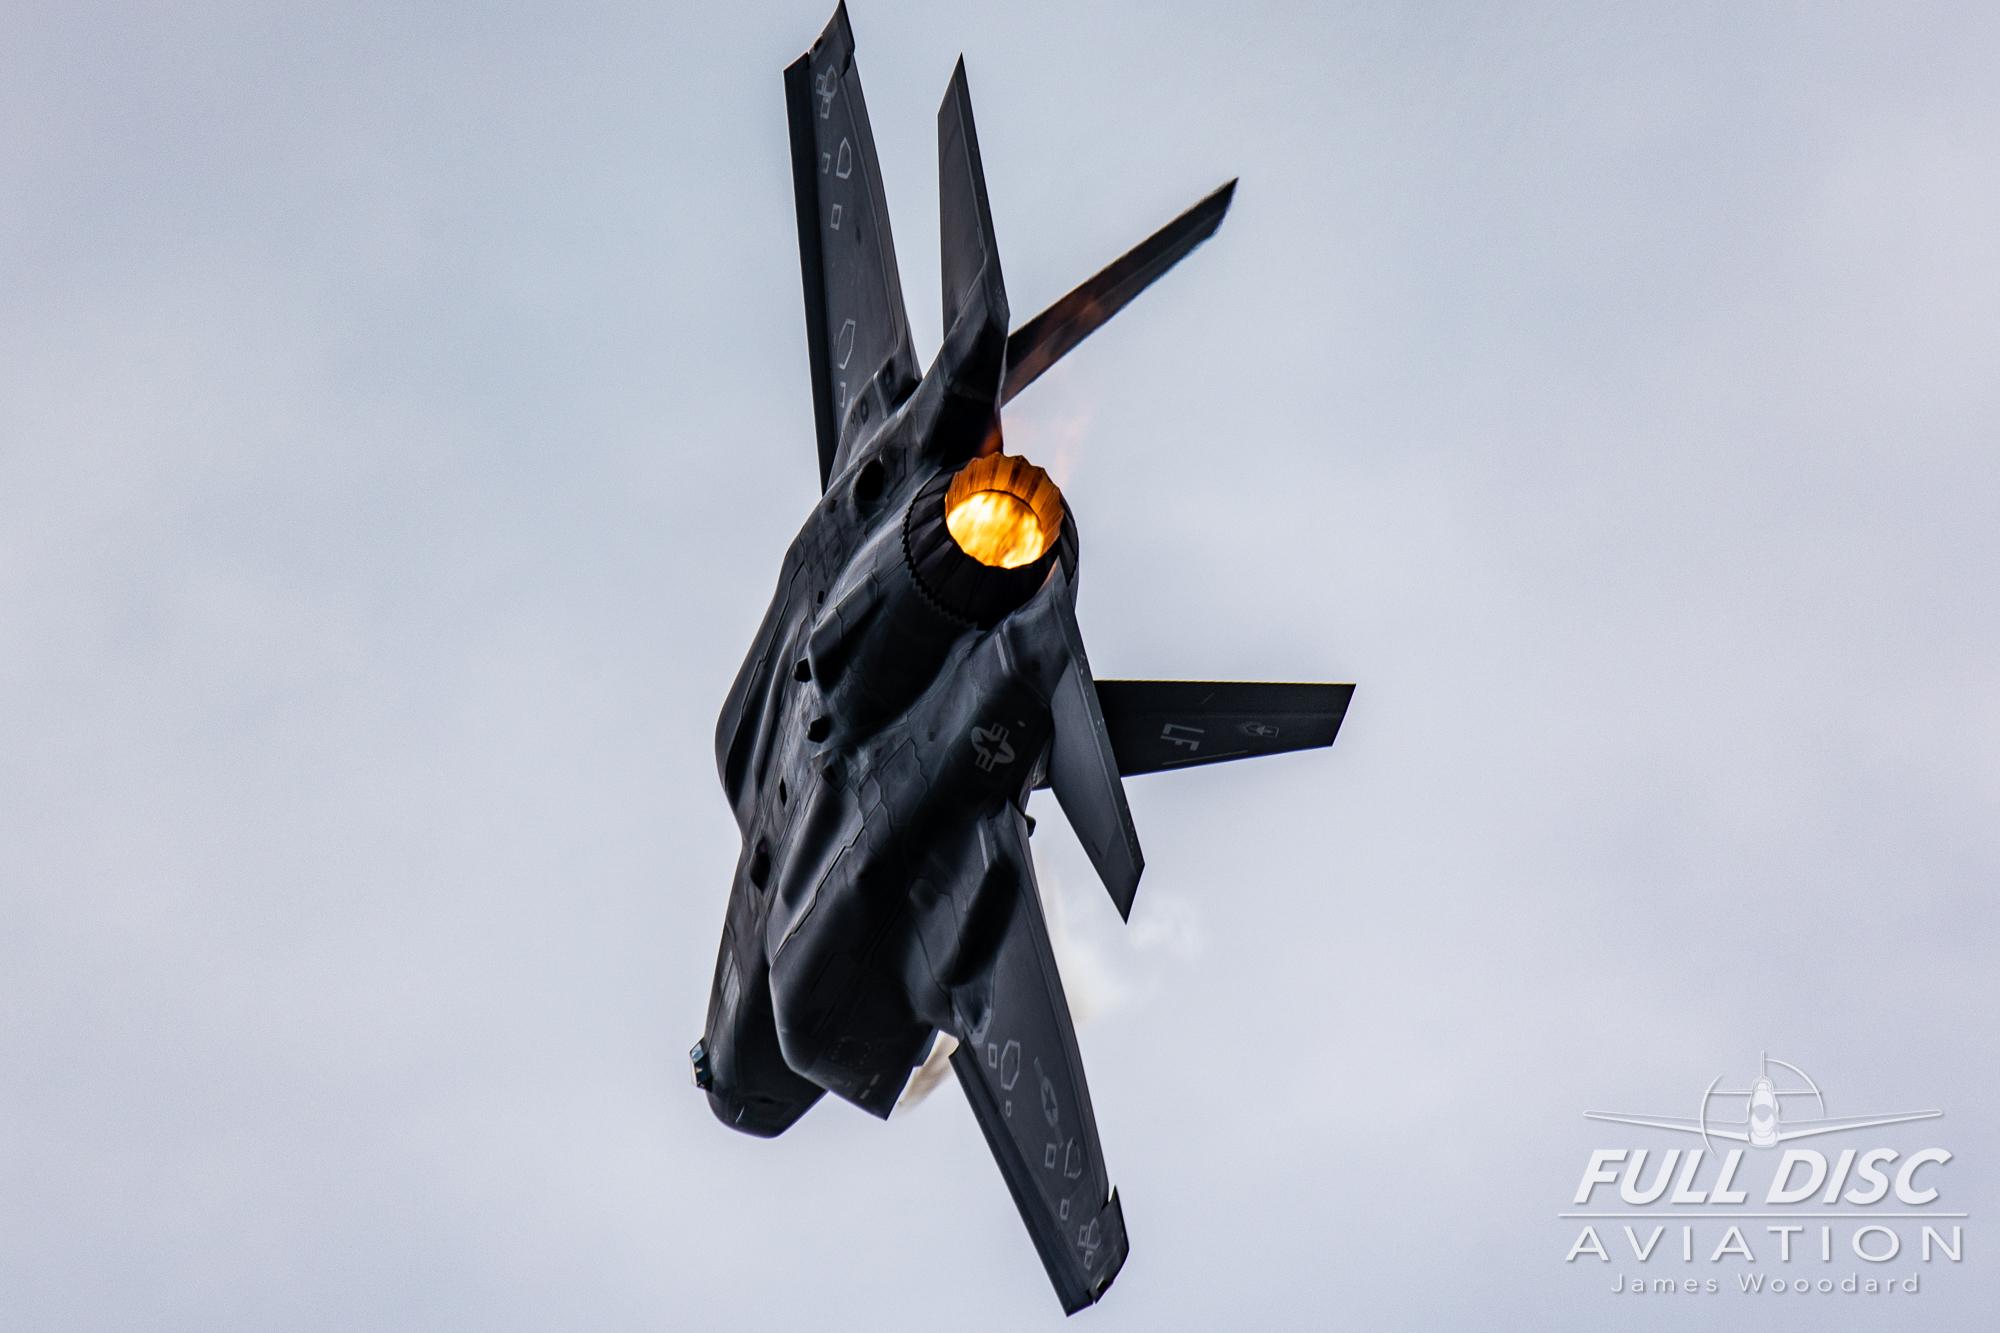 F35DemoTeam_FullDiscAviation_JamesWoodard-April 28, 2019-37.jpg